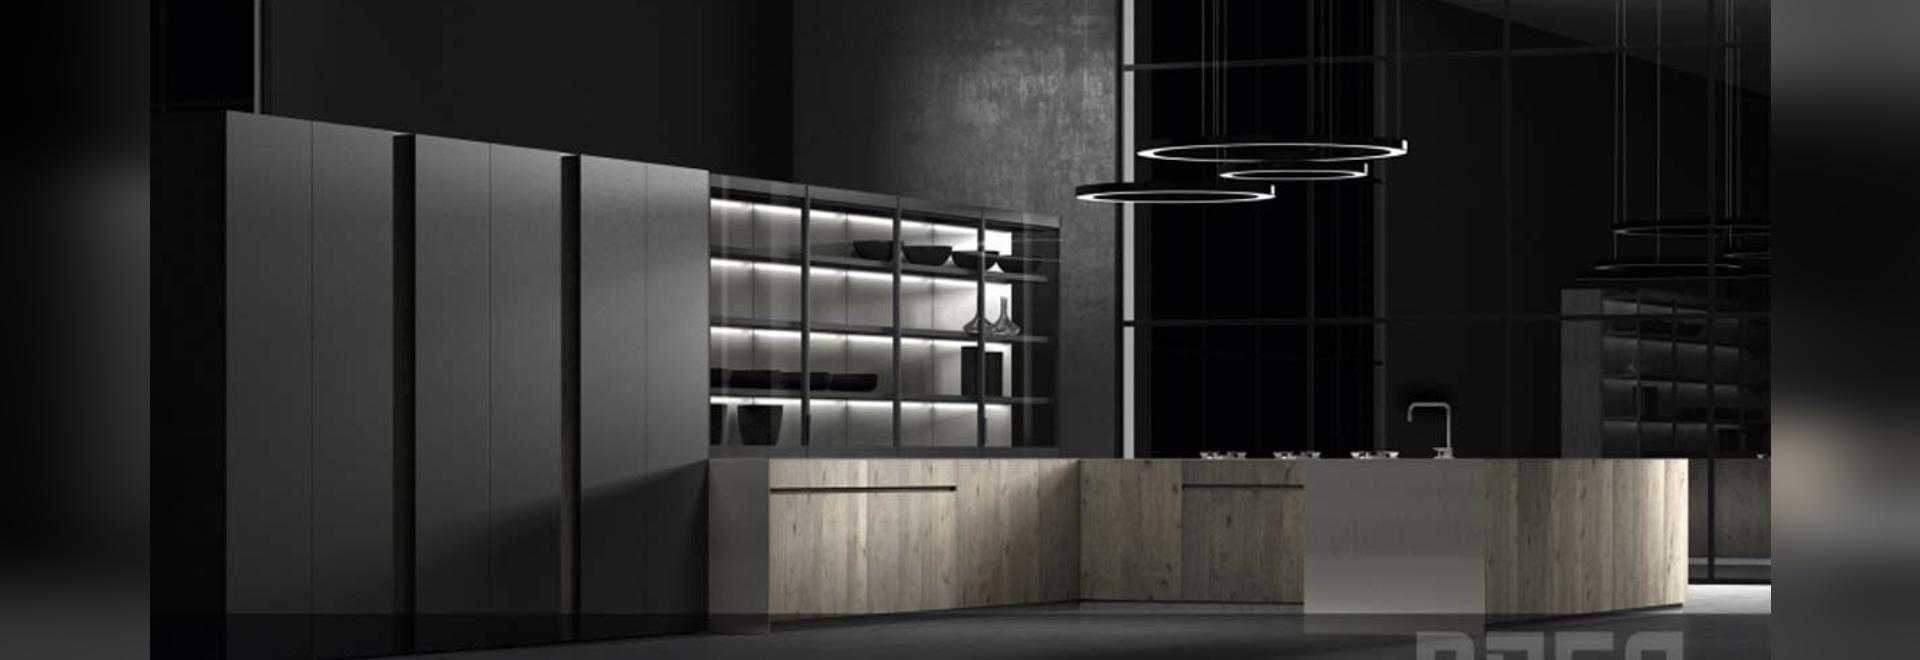 Doca returns to participate in the International Kitchen Exhibition held in Milan.